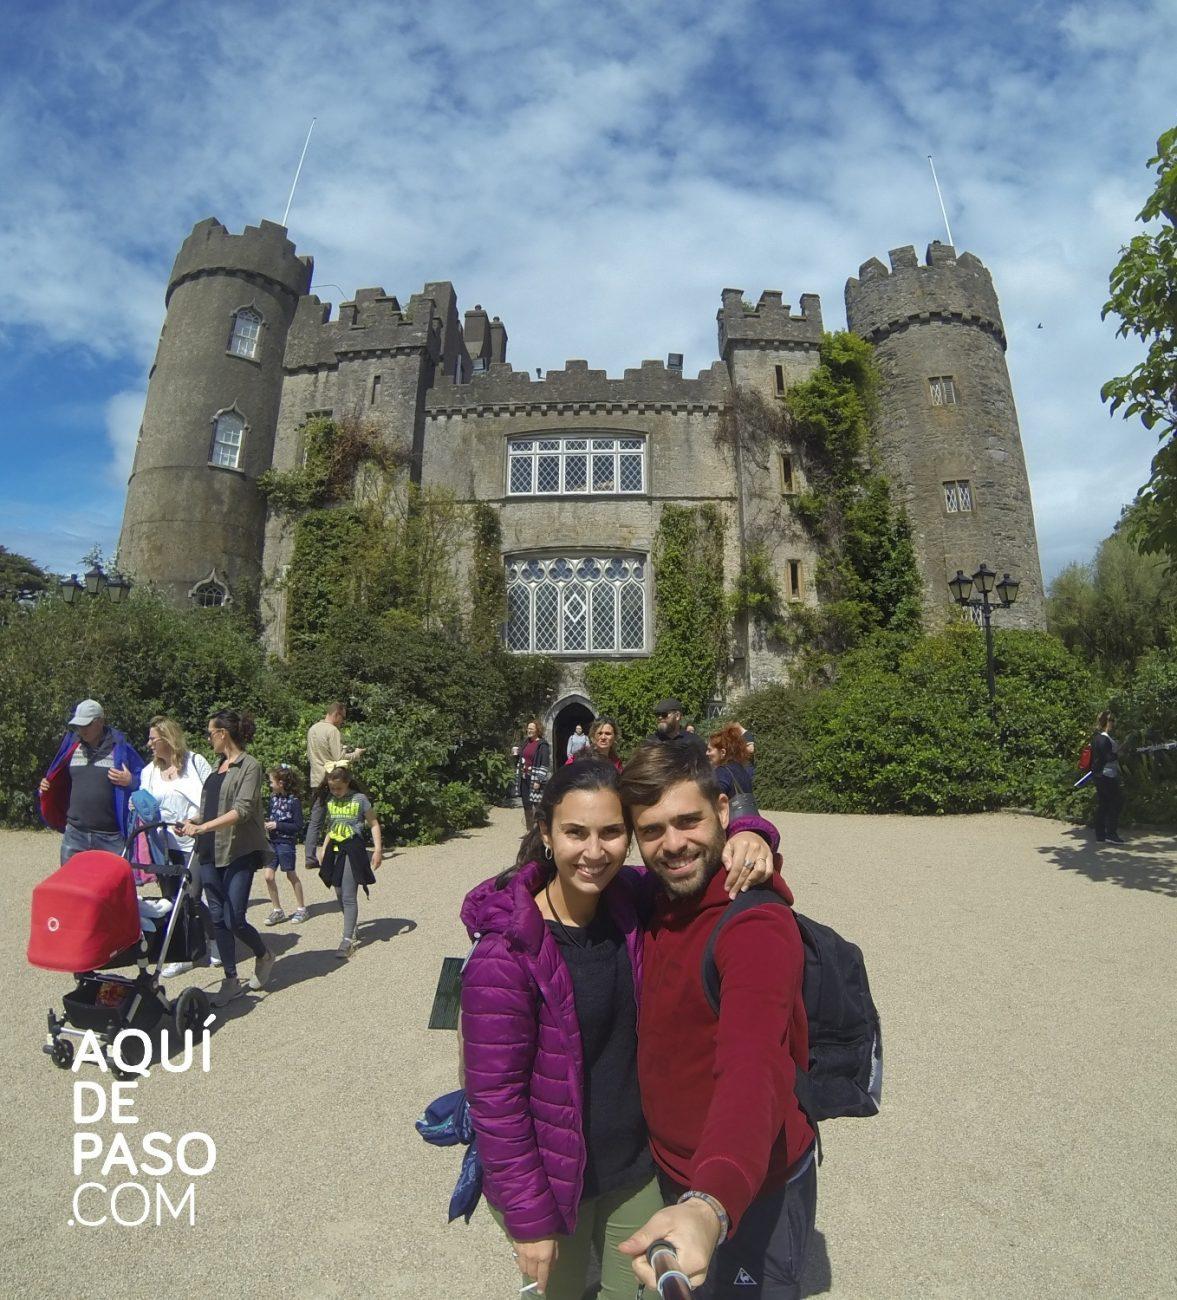 Malahide Castle - Aquidepaso.com